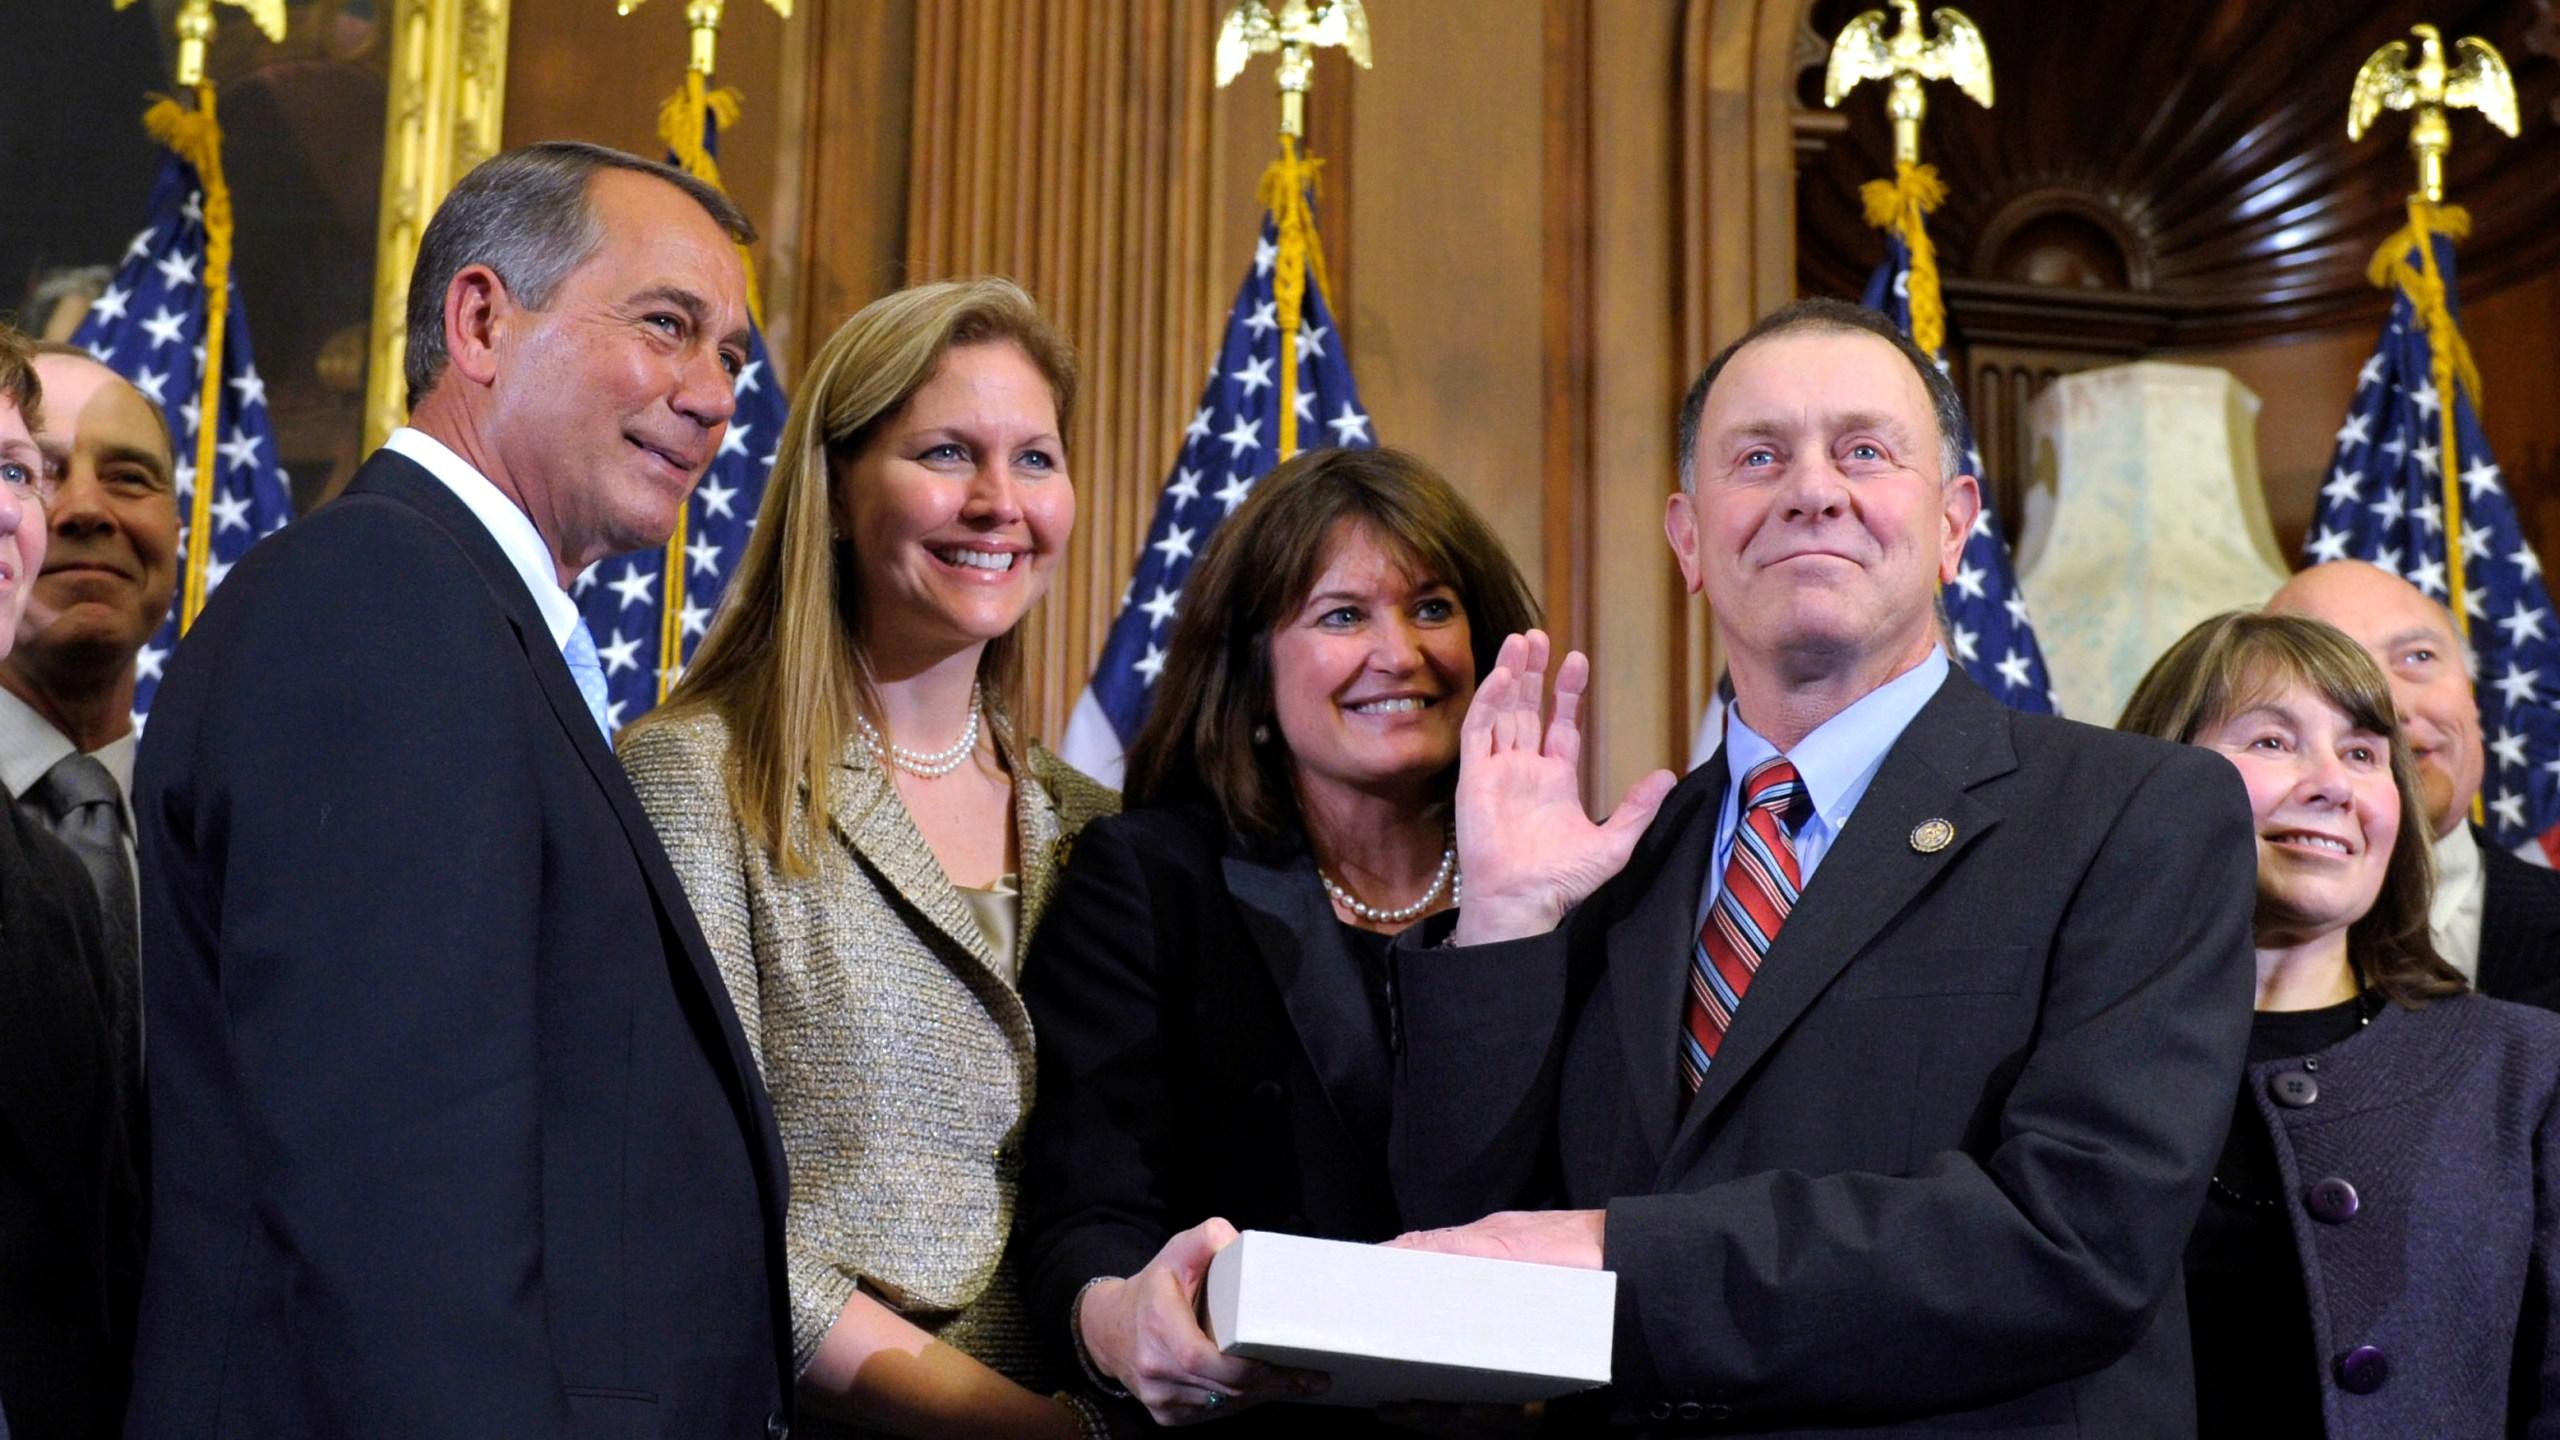 John Boehner, Richard Hanna